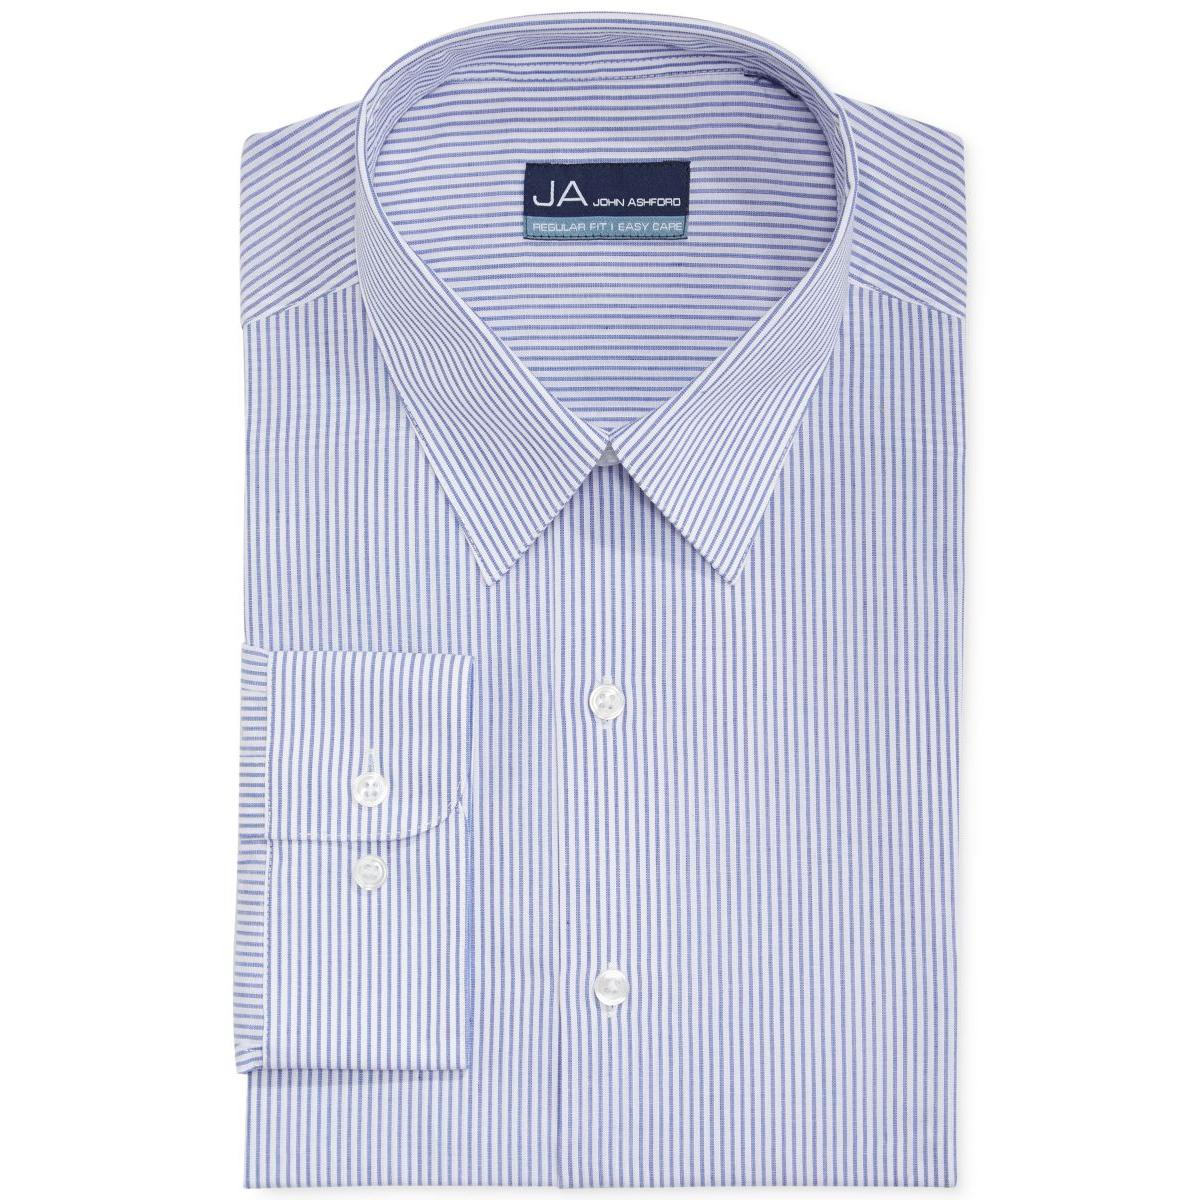 John ashford 9876 mens blue regular fit striped dress for Regular fit dress shirt